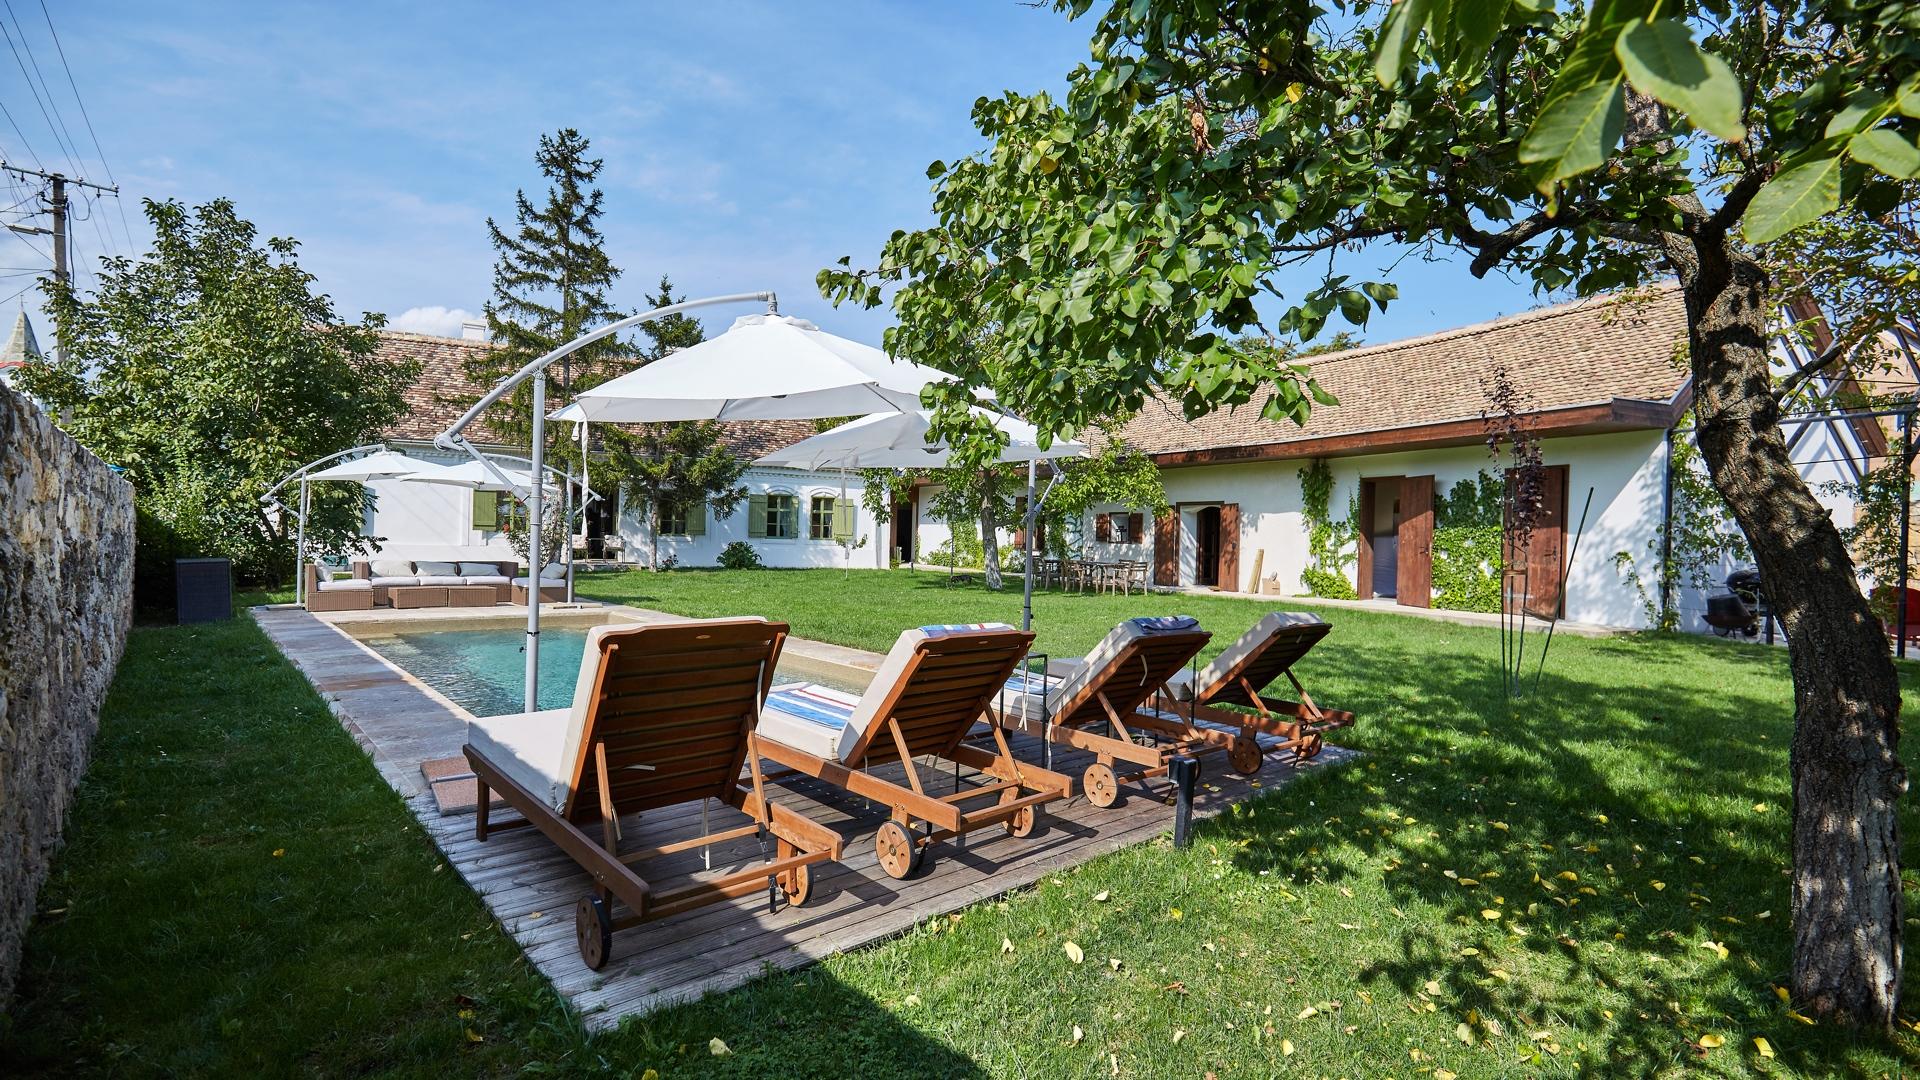 North Shore Bedroom Luxury Villa Hanna At Lake Balaton Hip Homes Hungary